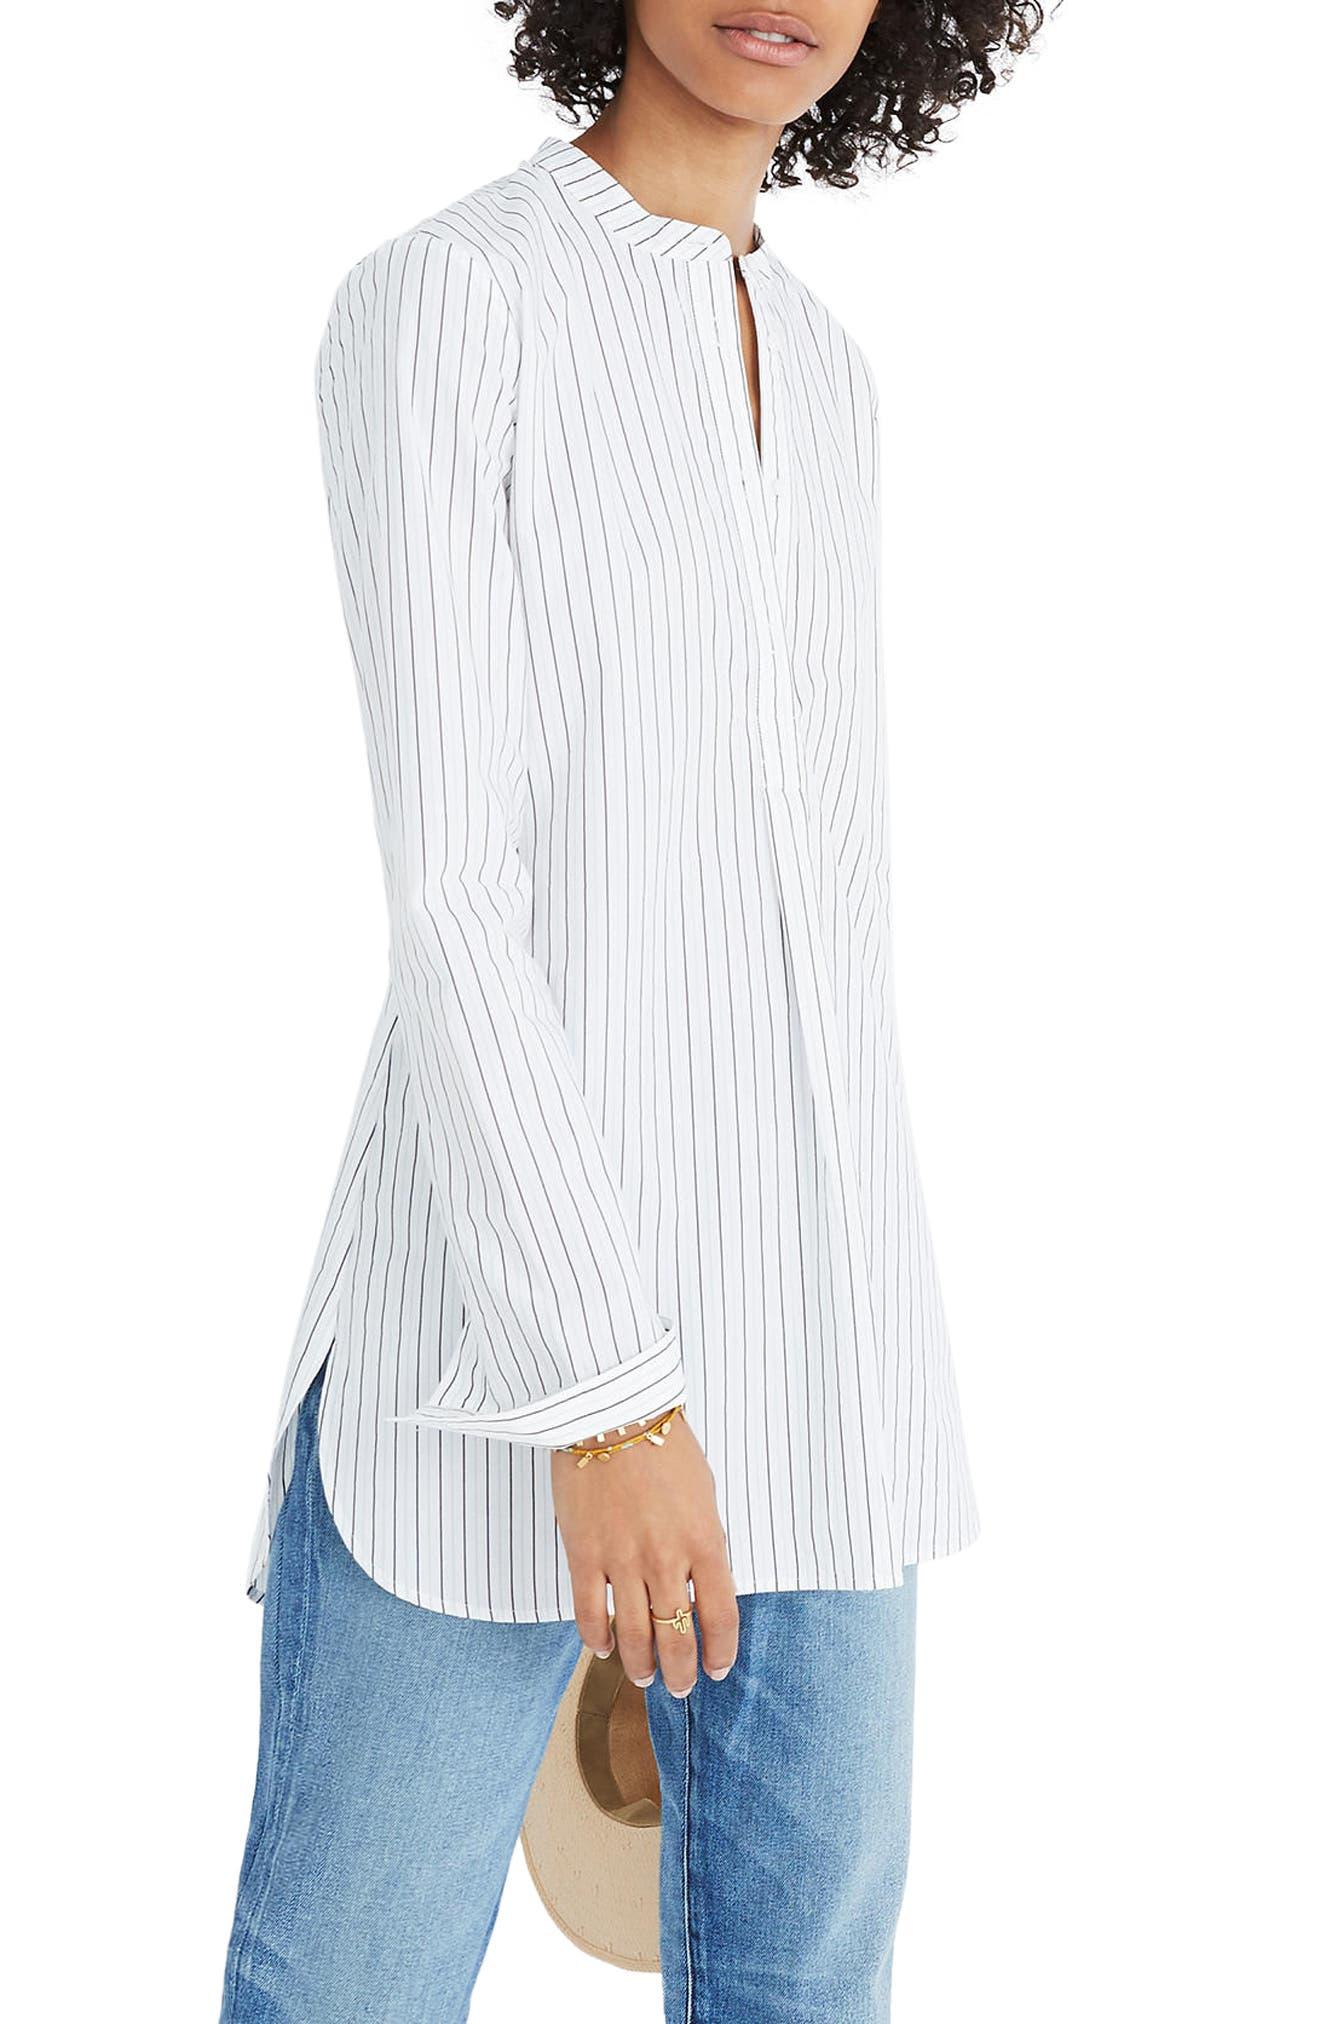 Wellspring Stripe Tunic Popover Shirt,                             Main thumbnail 1, color,